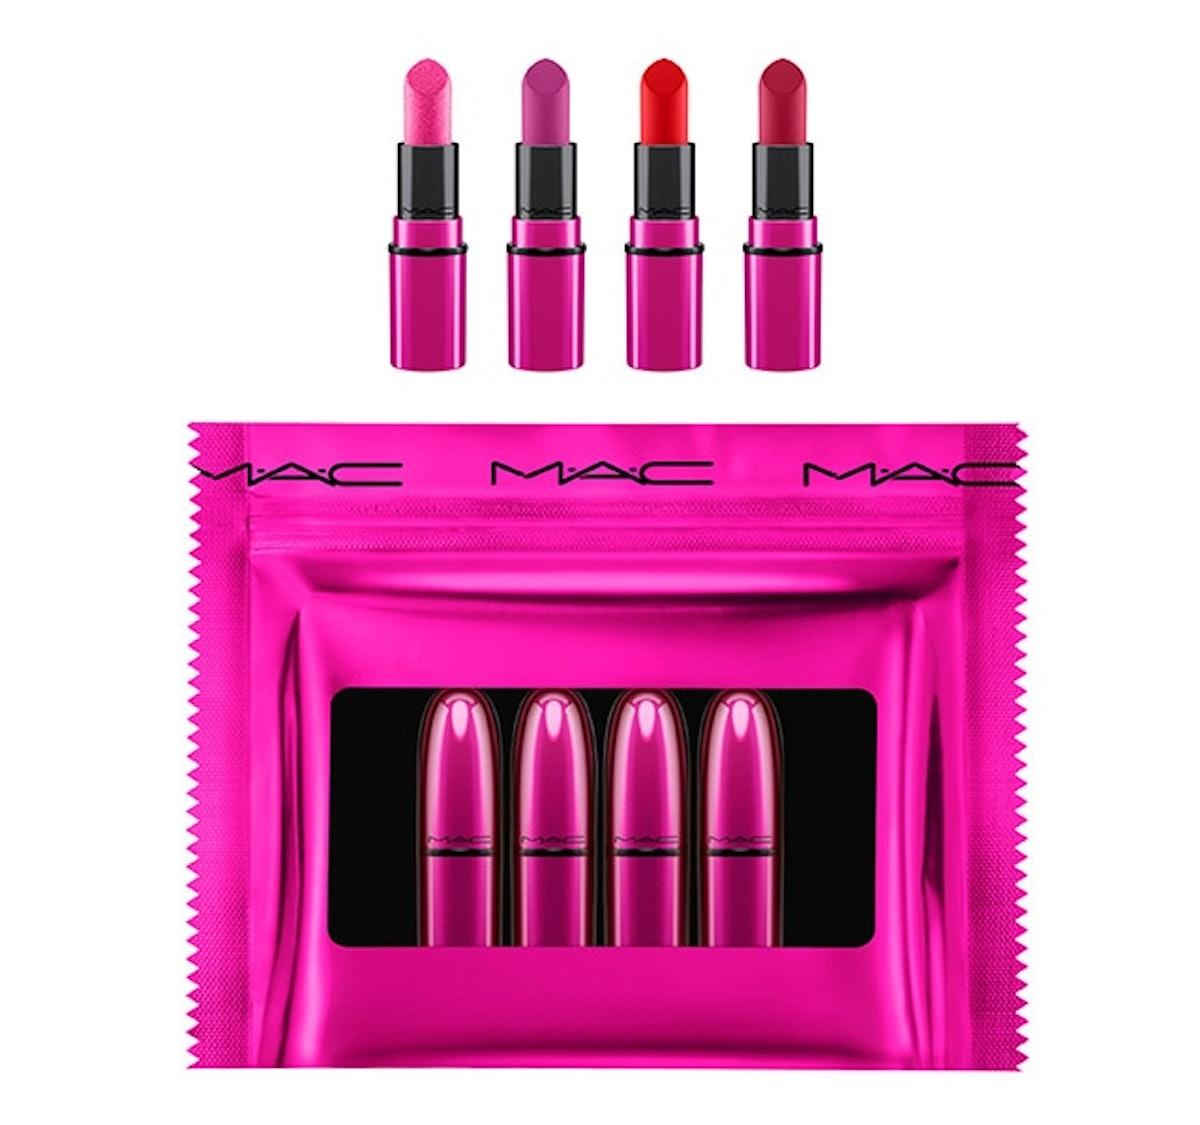 Mini Lipsticks: Brights